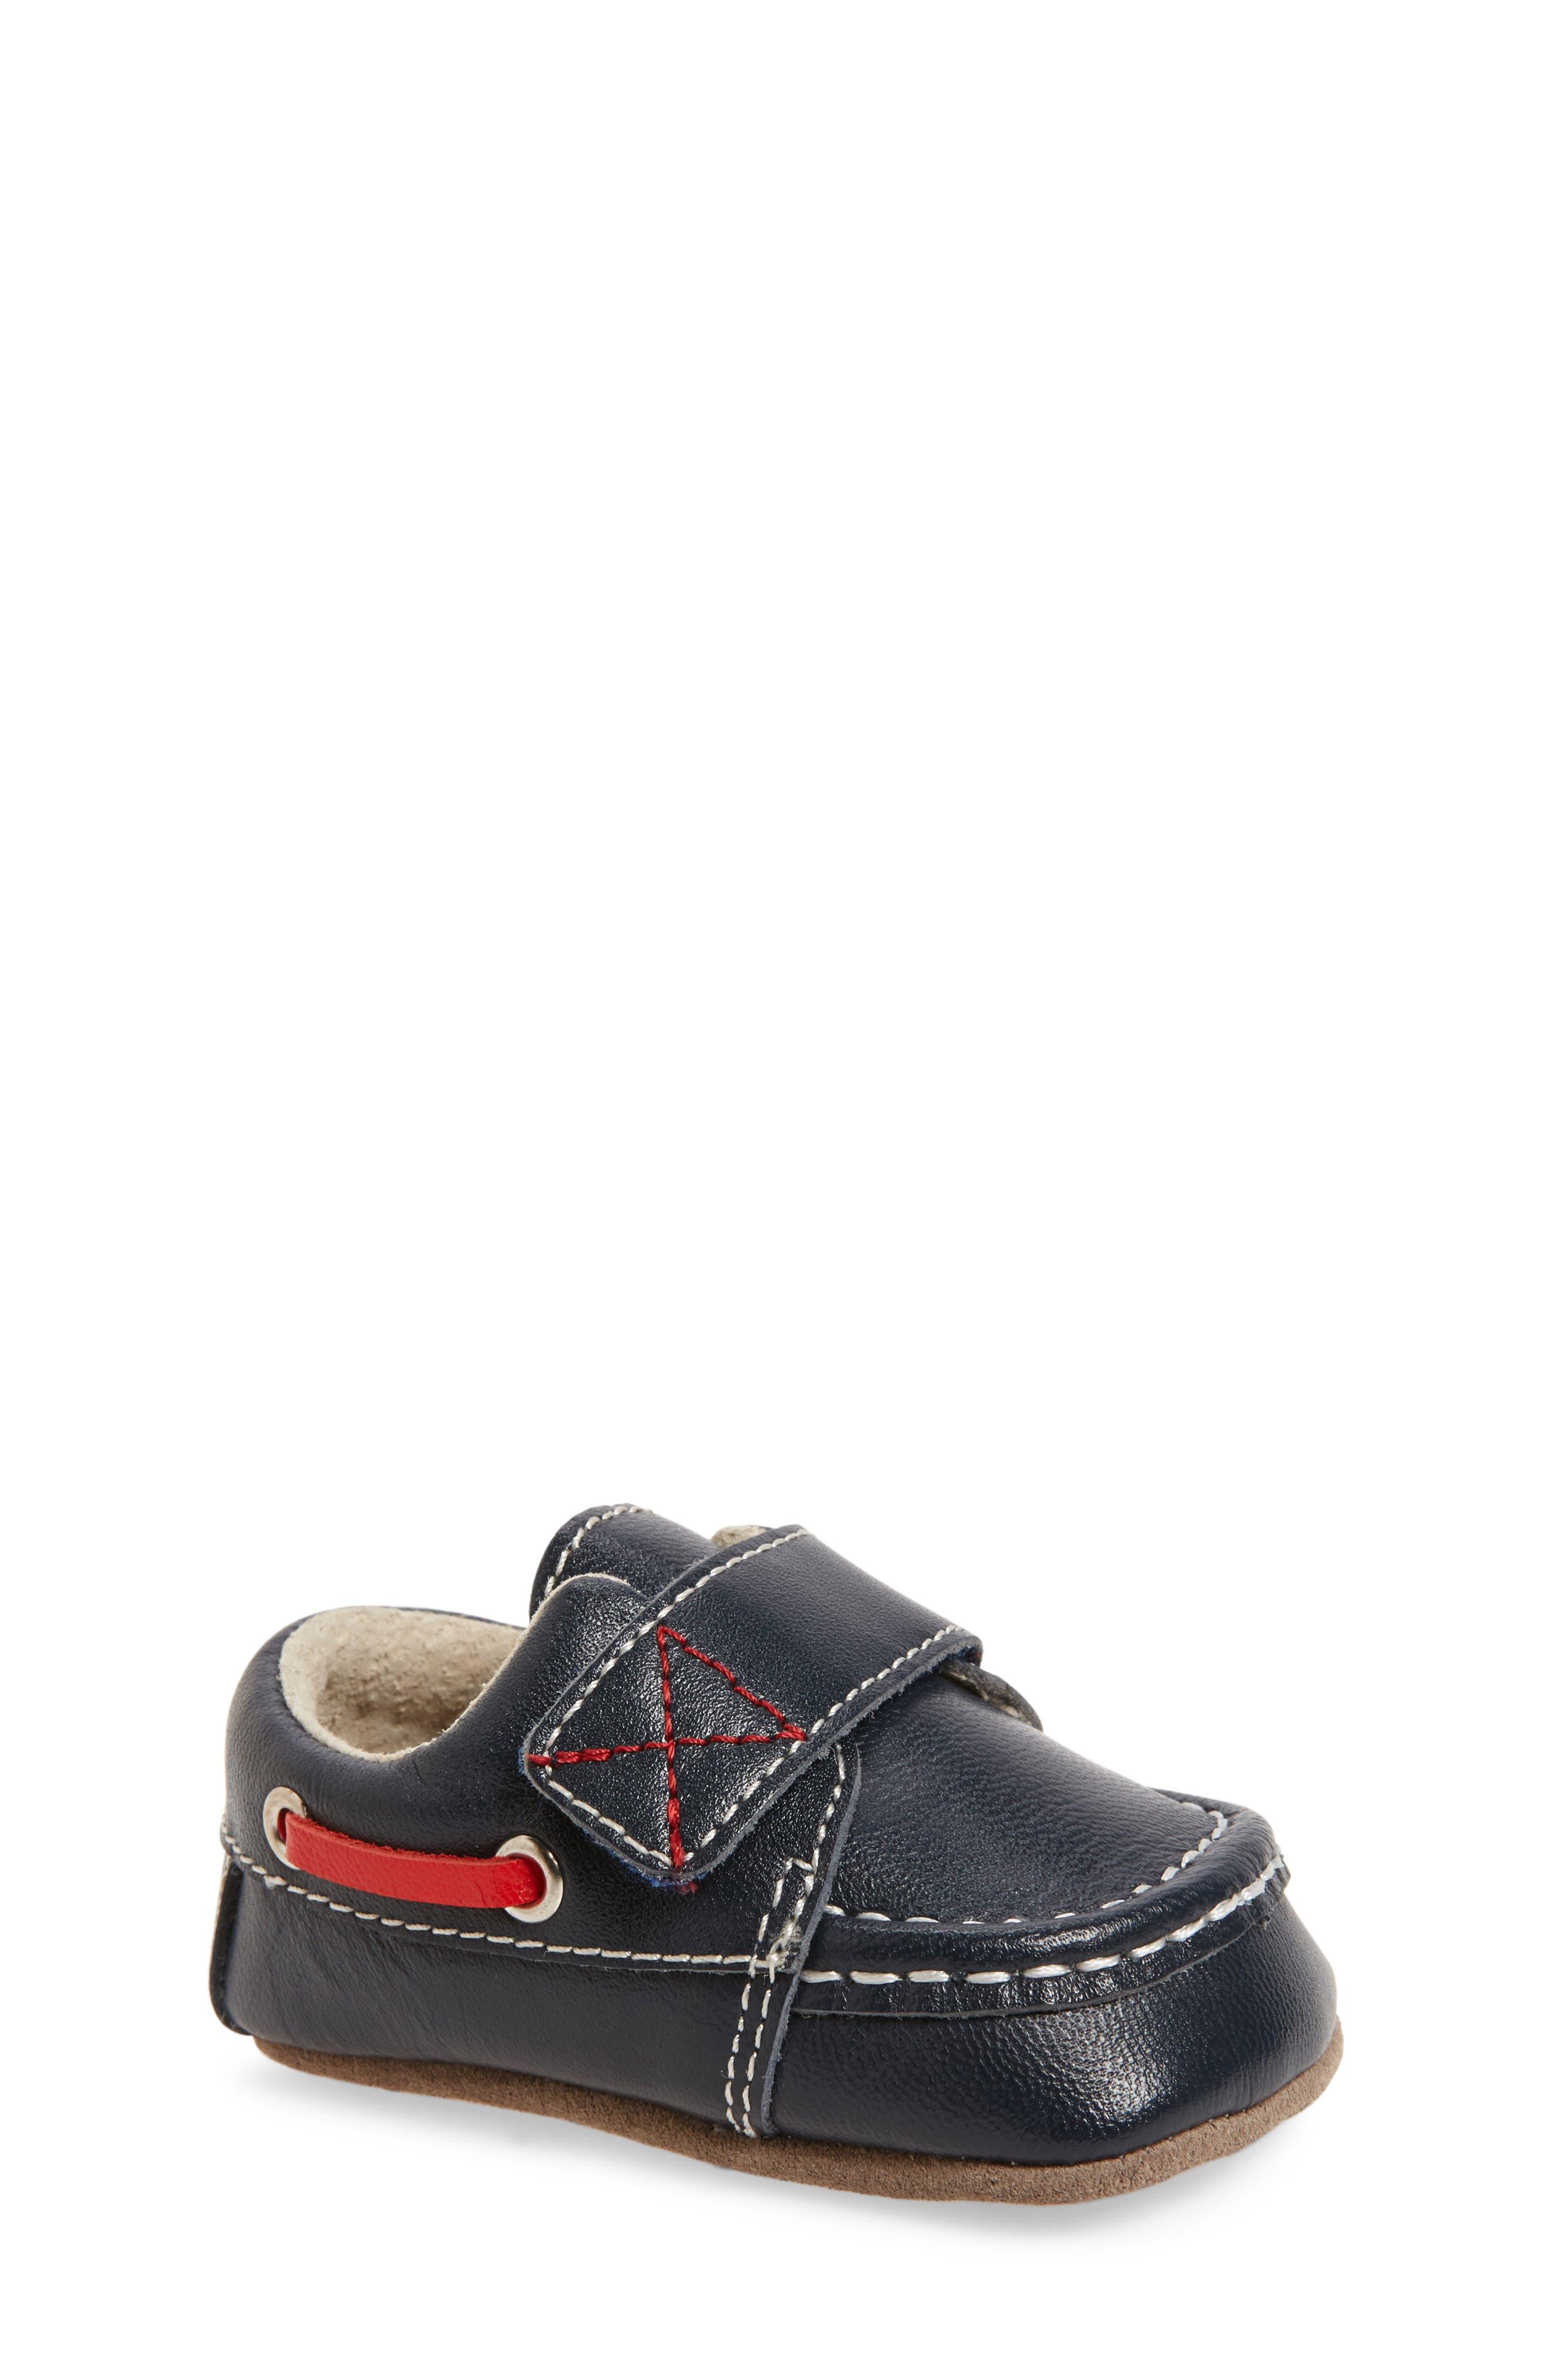 See Kai Run Milton Boat Shoe (Baby)